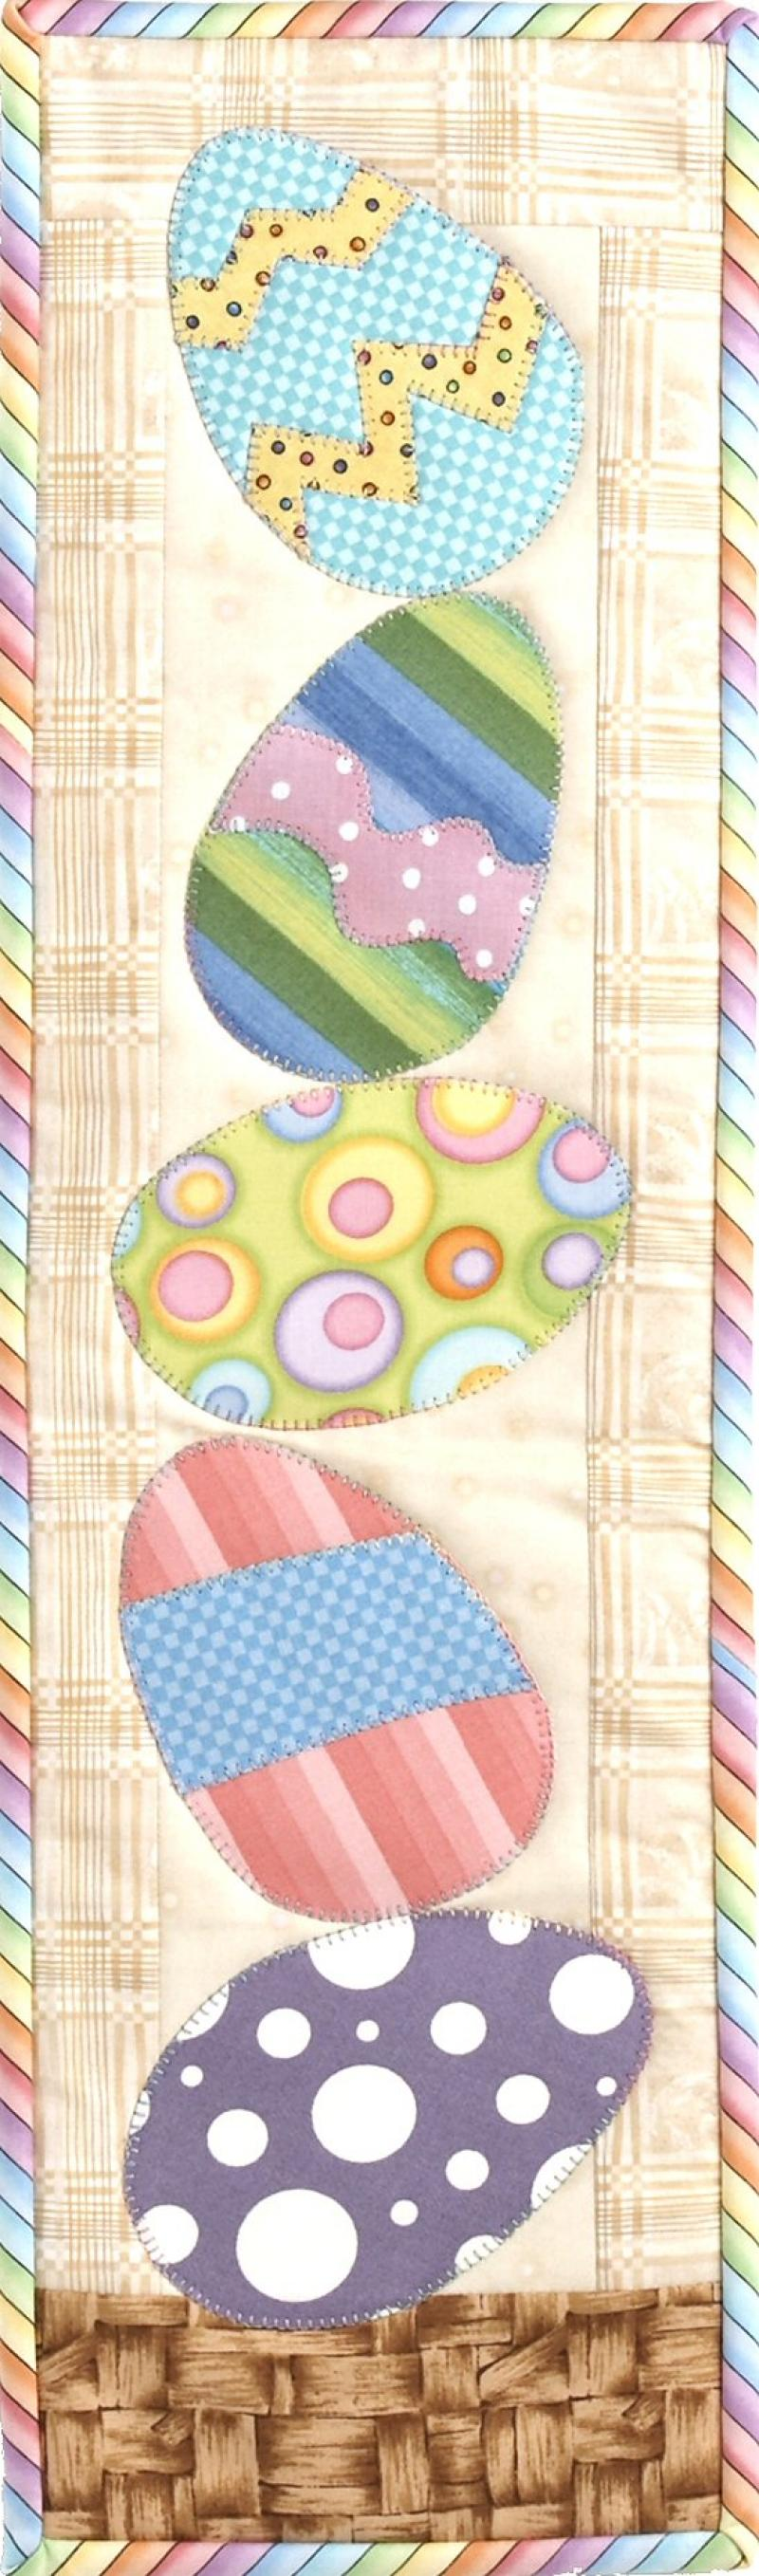 MM04 Easter Eggs - DIGITAL DOWNLOAD